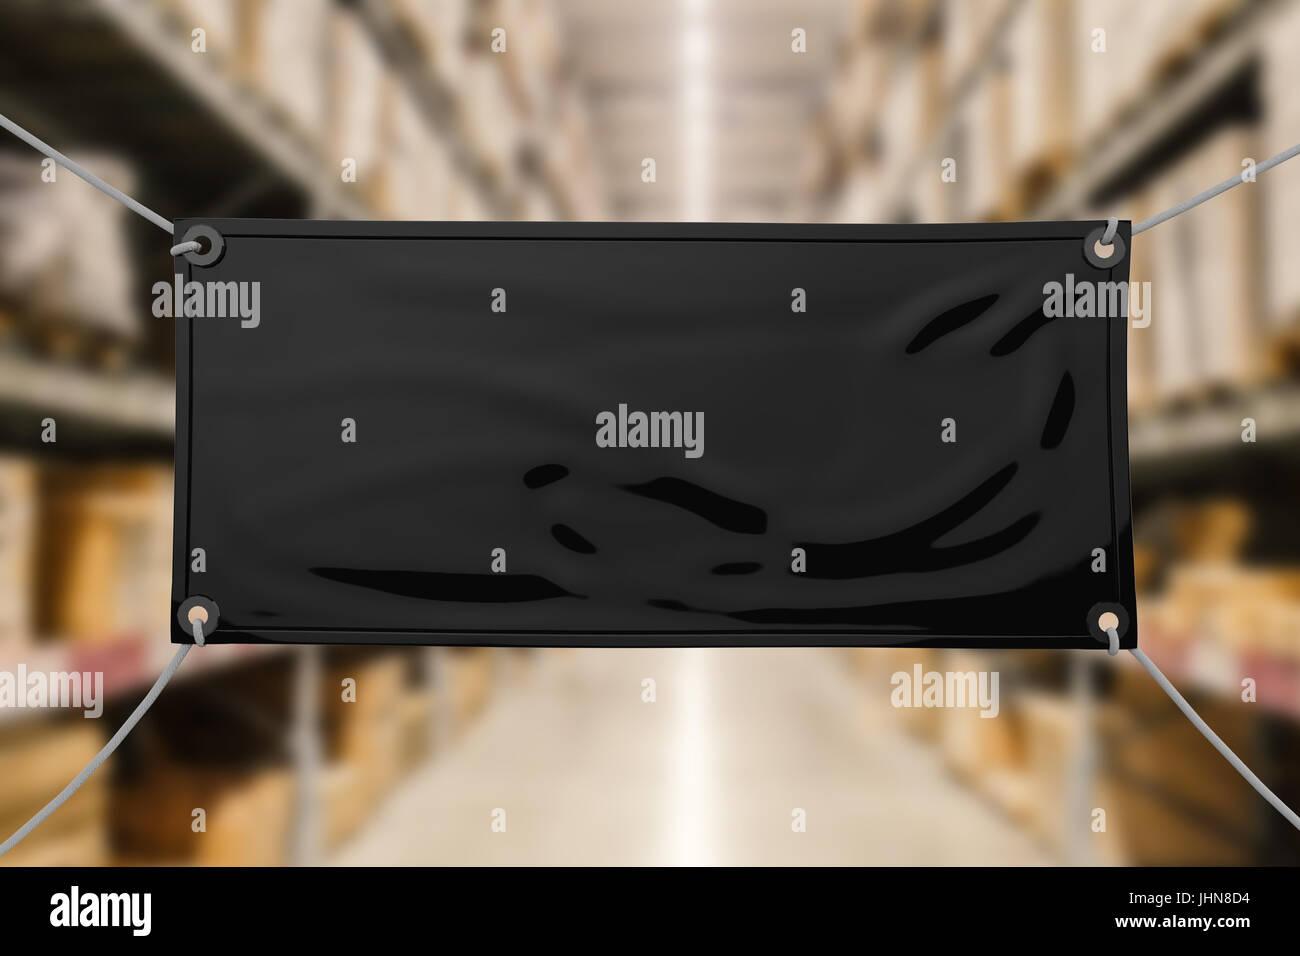 Black Blank Vinyl Banner Hanging Stock Photo Royalty Free Image - Blank vinyl banners